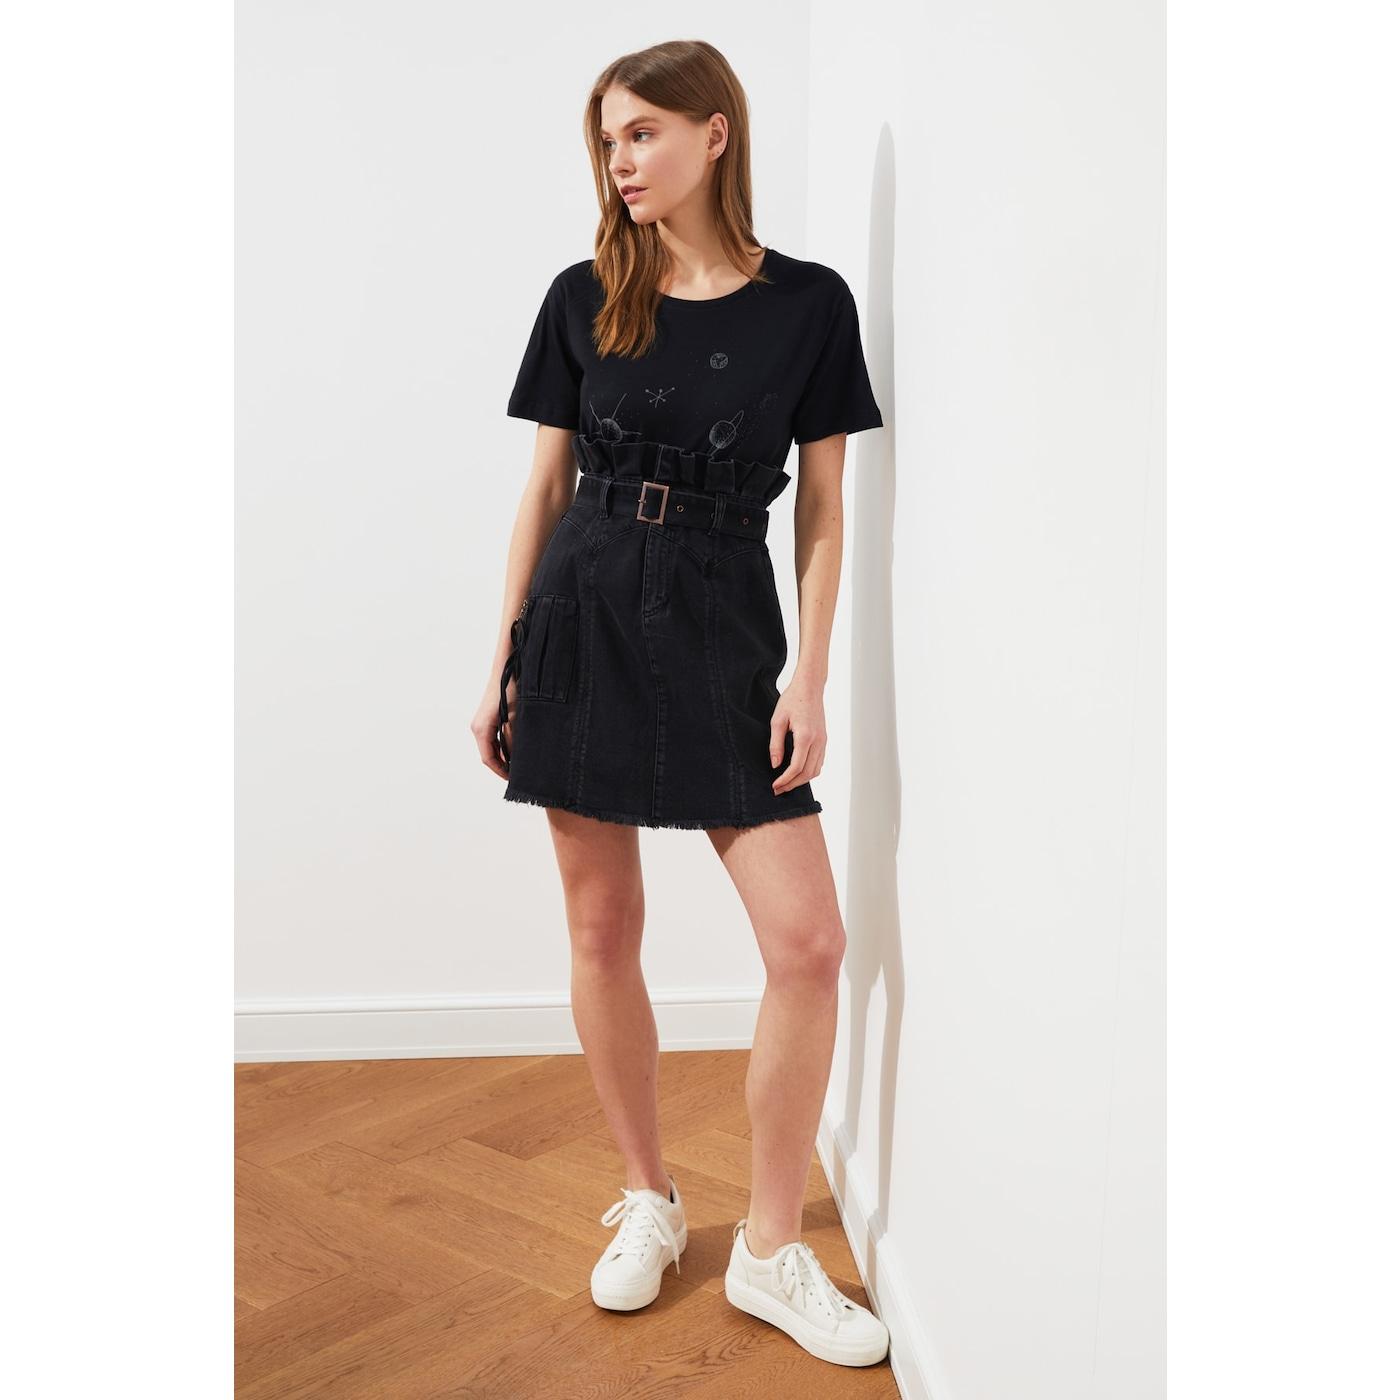 Trendyol Anthracite Waist Ruffled Belt Mini Denim Skirt dámské 38